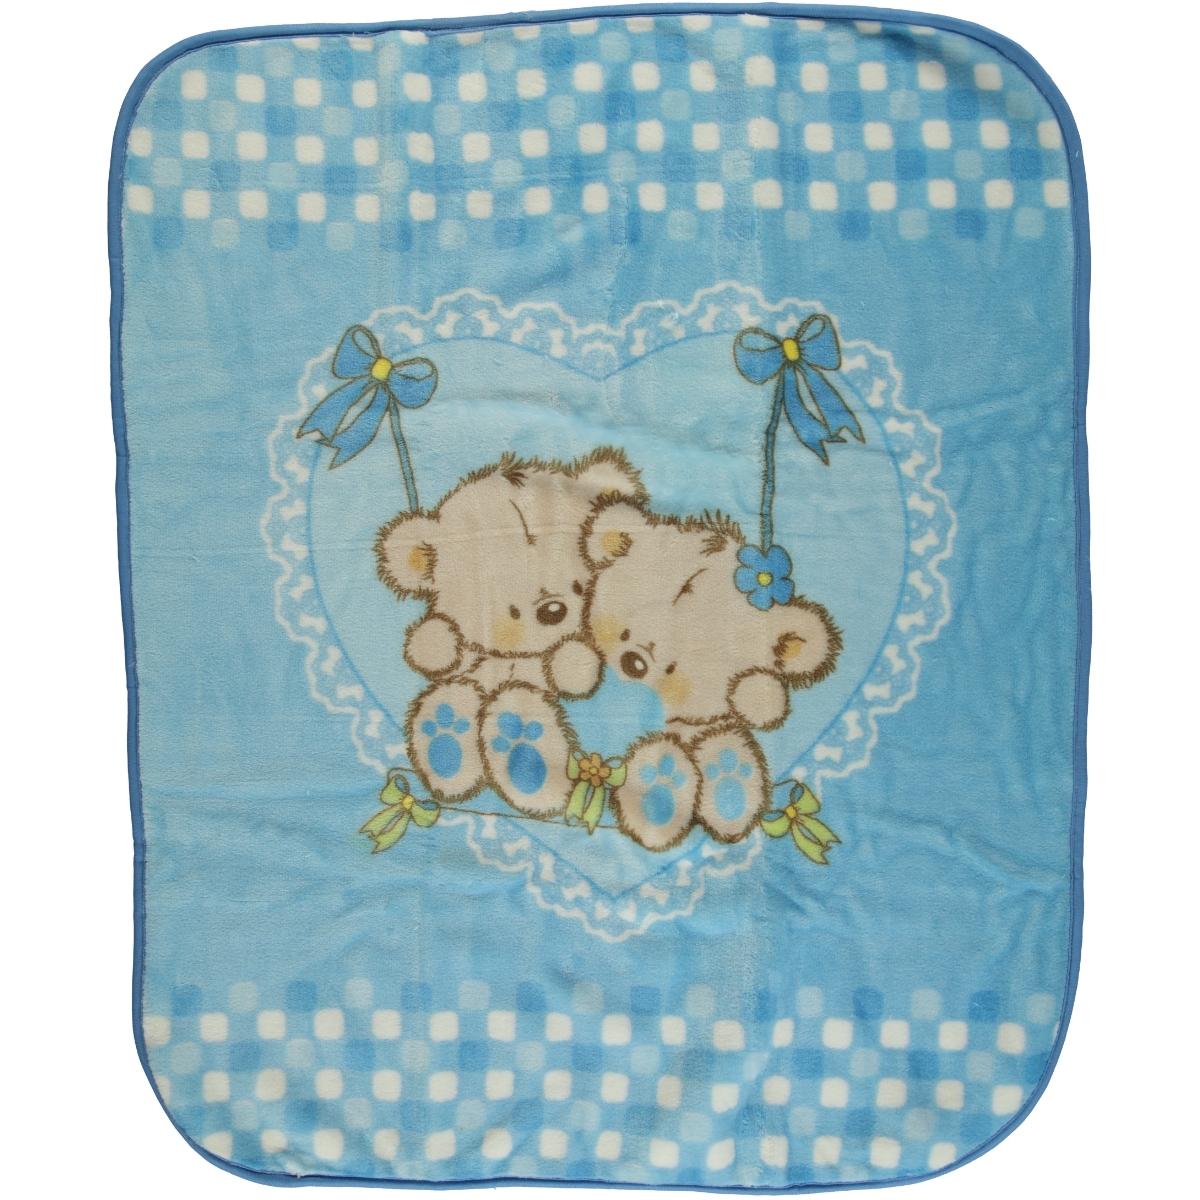 İlk Cemre Records Plush Blanket Blue cm will be installed